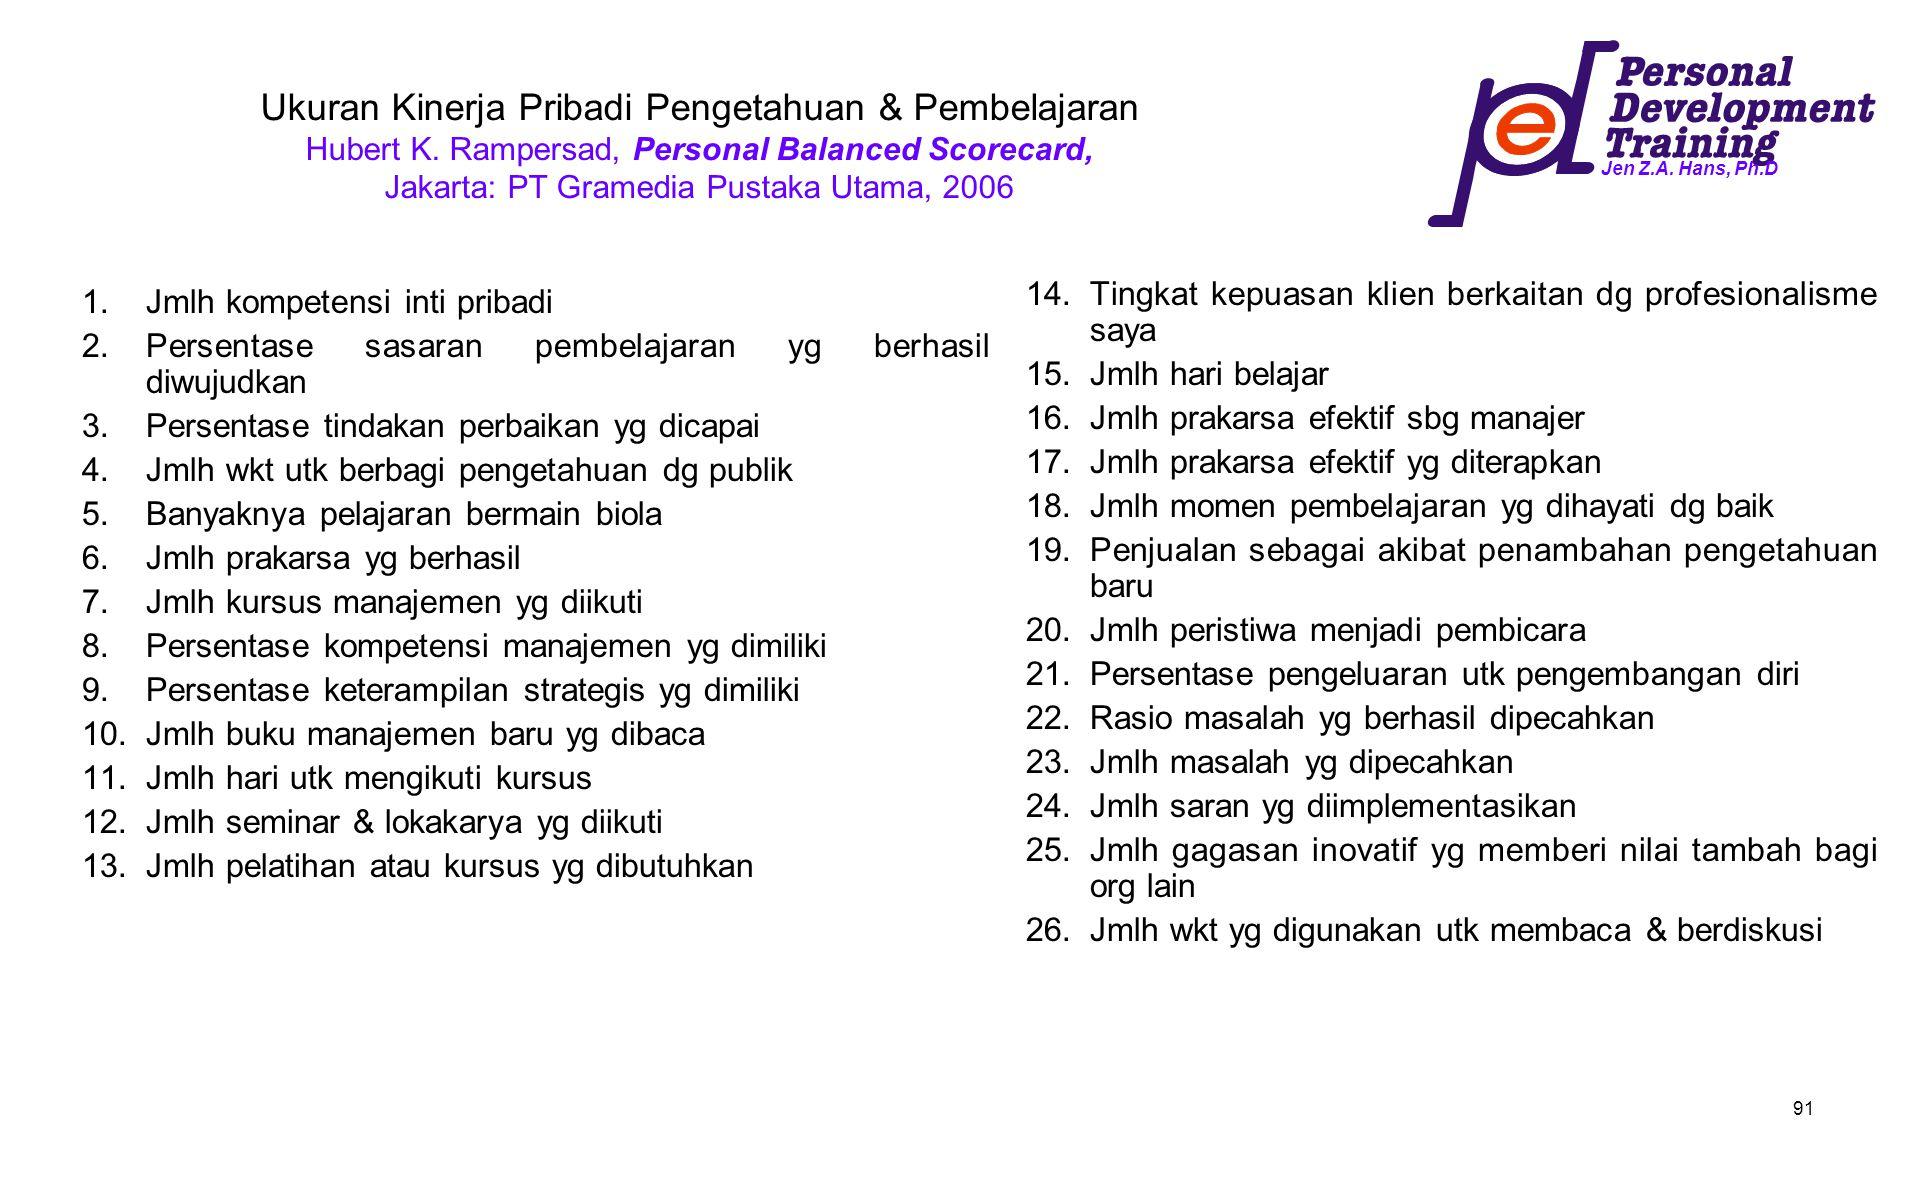 Jen Z.A. Hans, Ph.D 91 Ukuran Kinerja Pribadi Pengetahuan & Pembelajaran Hubert K. Rampersad, Personal Balanced Scorecard, Jakarta: PT Gramedia Pustak